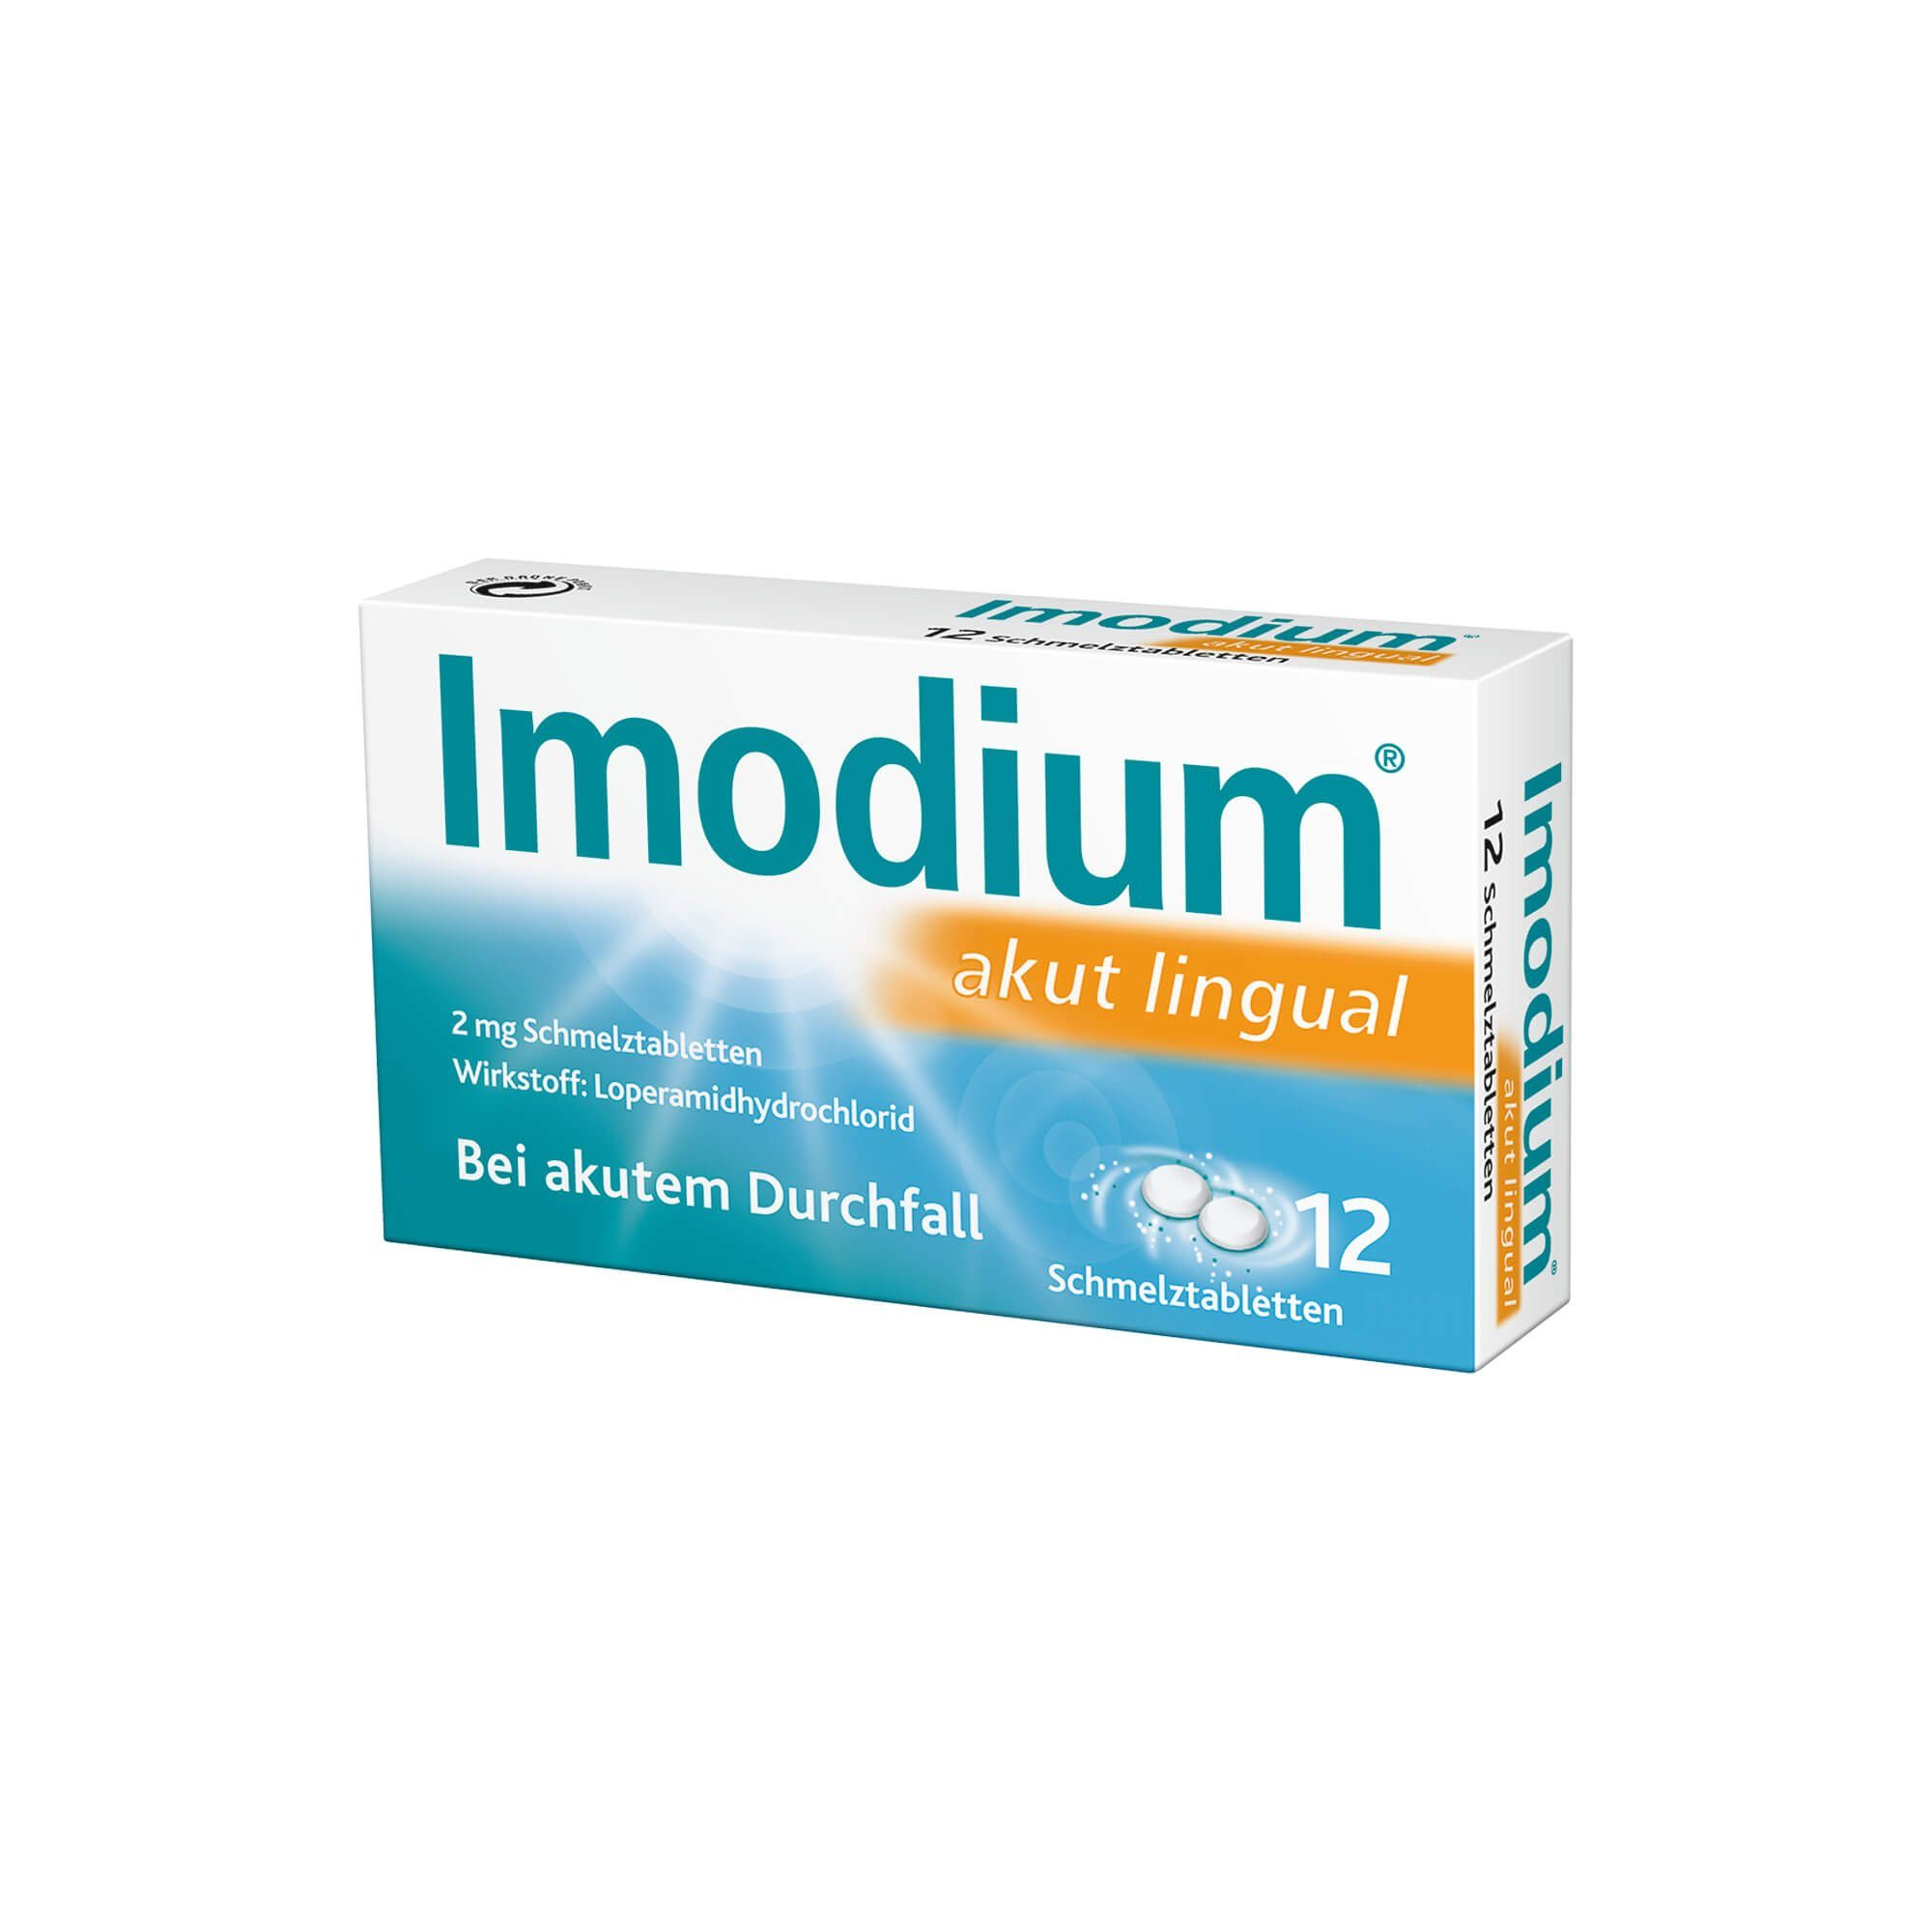 Imodium akut lingual Schmelztabletten , 12 St